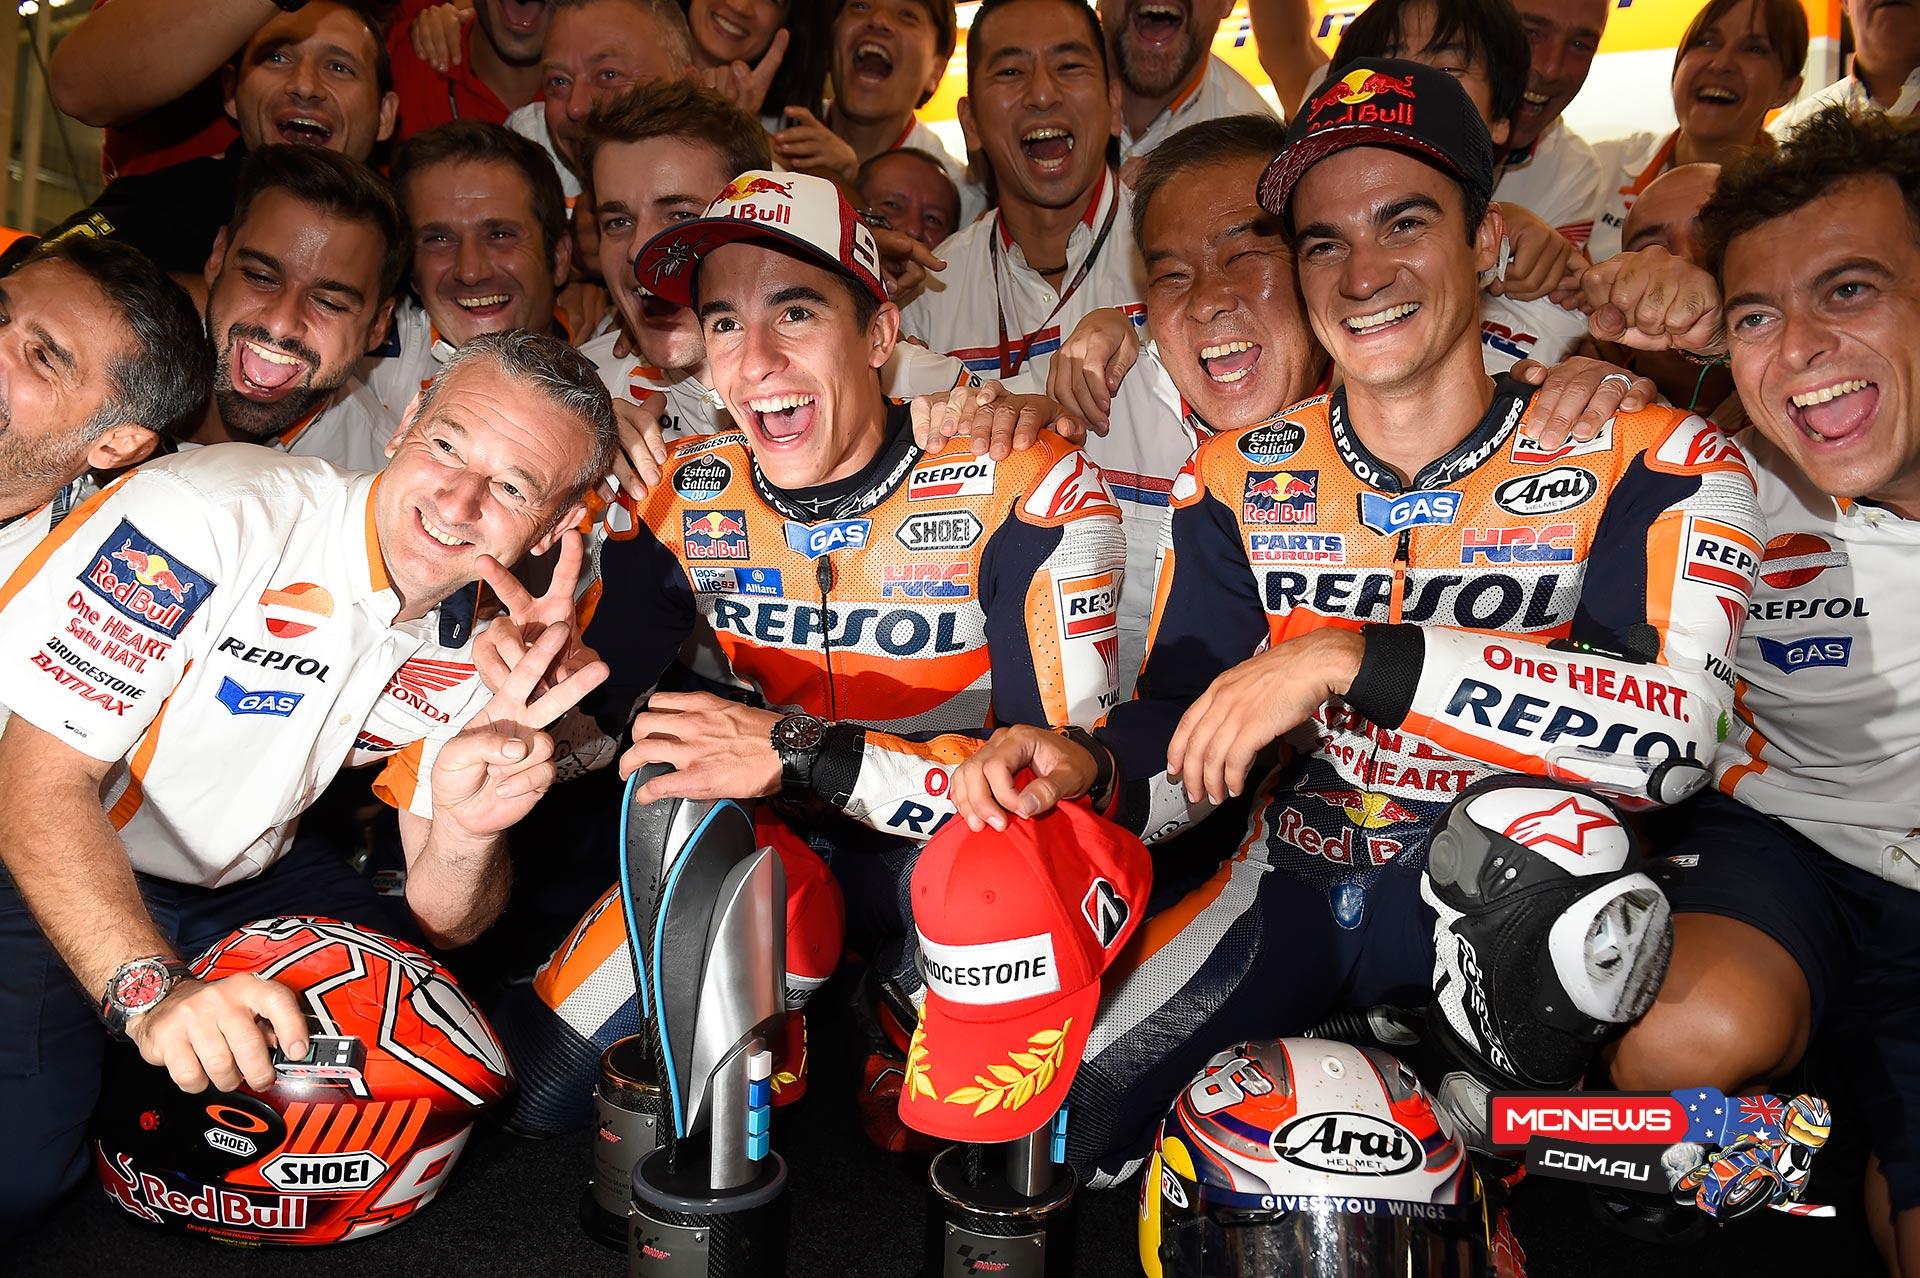 MotoGP 2015 - Round Nine - Sachsenring - Repsol Honda 1-2